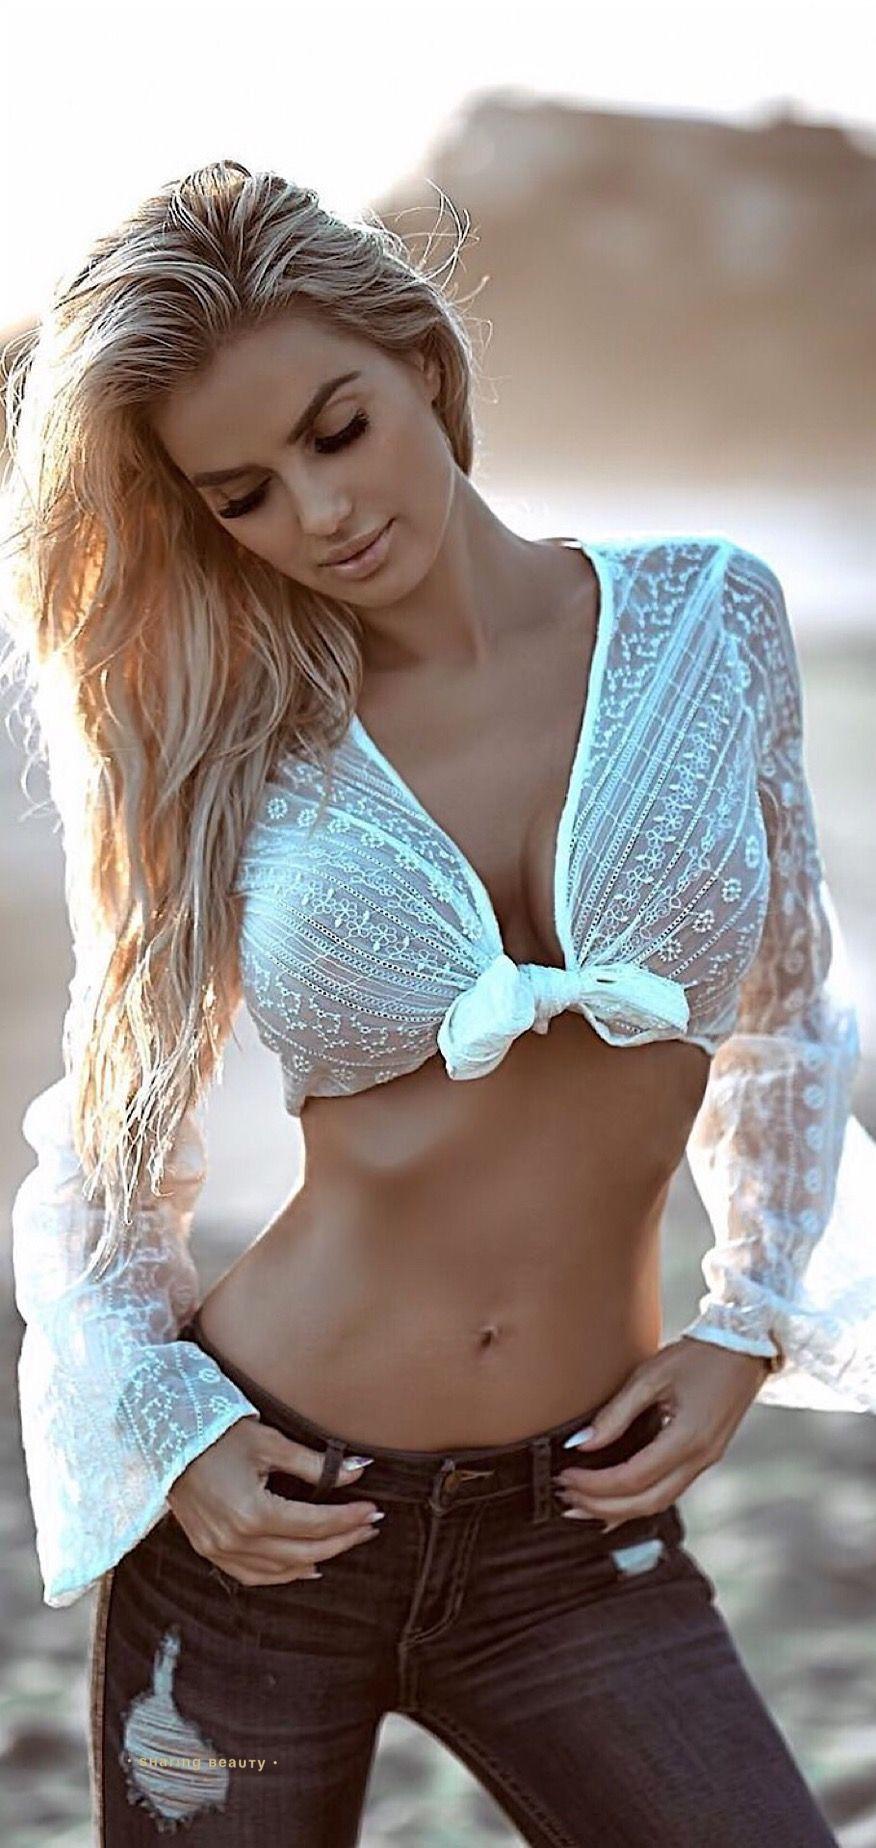 Boobs Emma Stern nude photos 2019